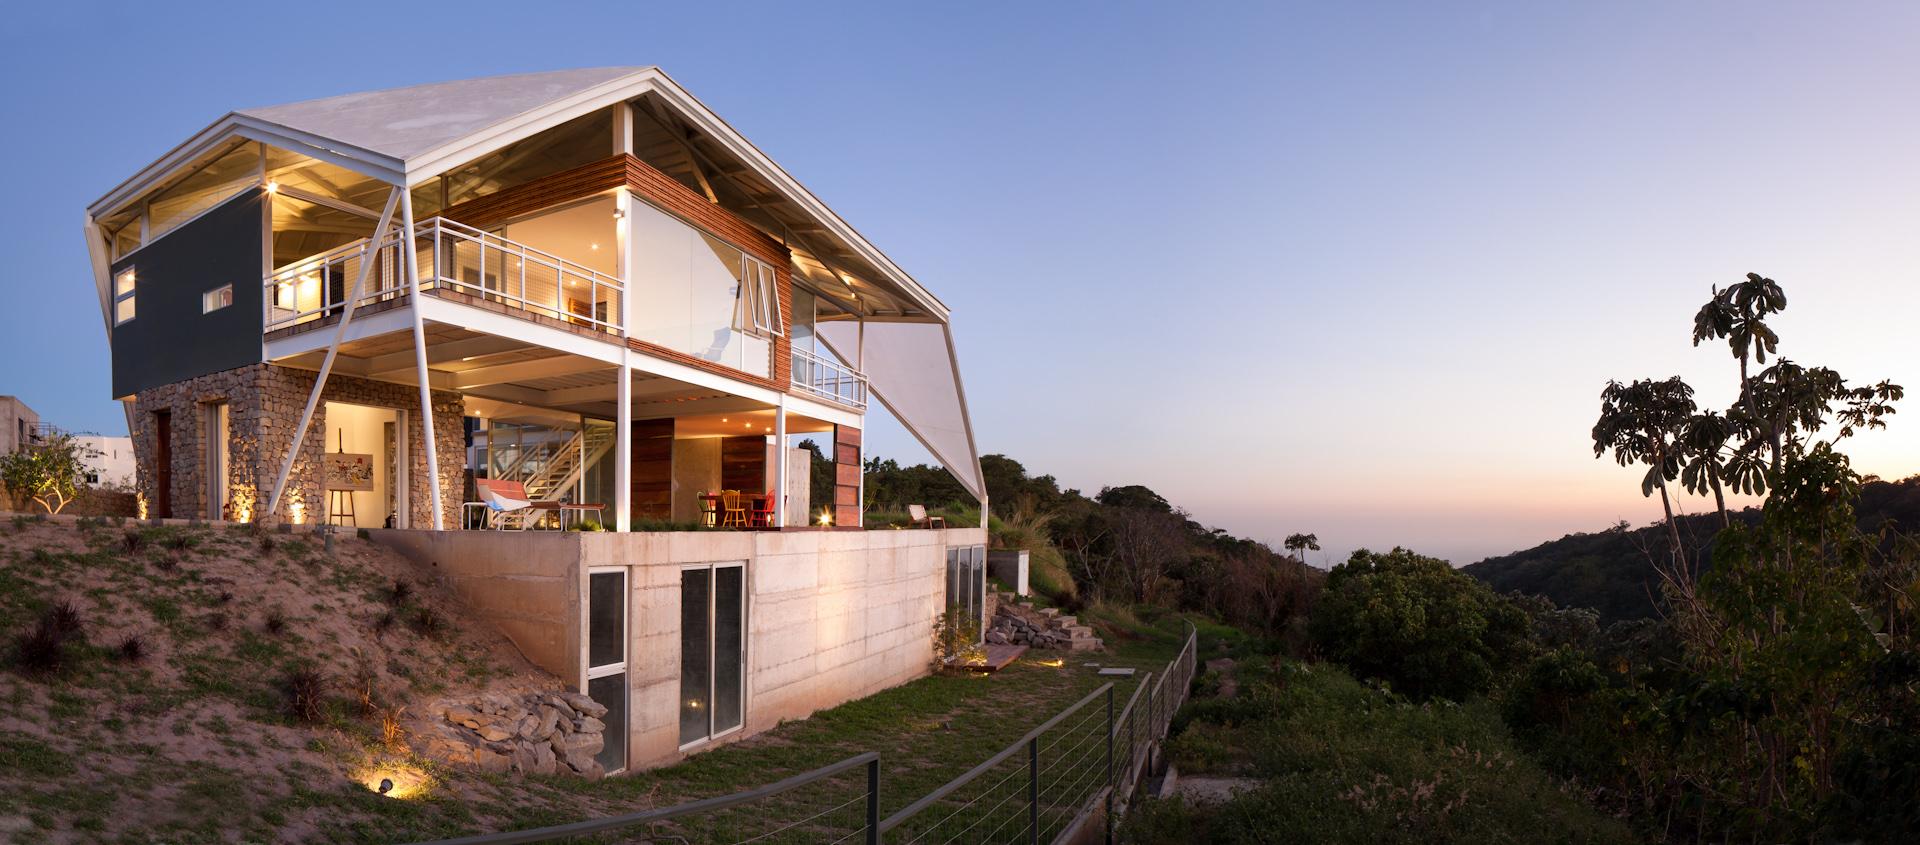 Architecture-Modern-La-Piscucha-El-Salvador-Jason-Bax-Dwell-05.JPG